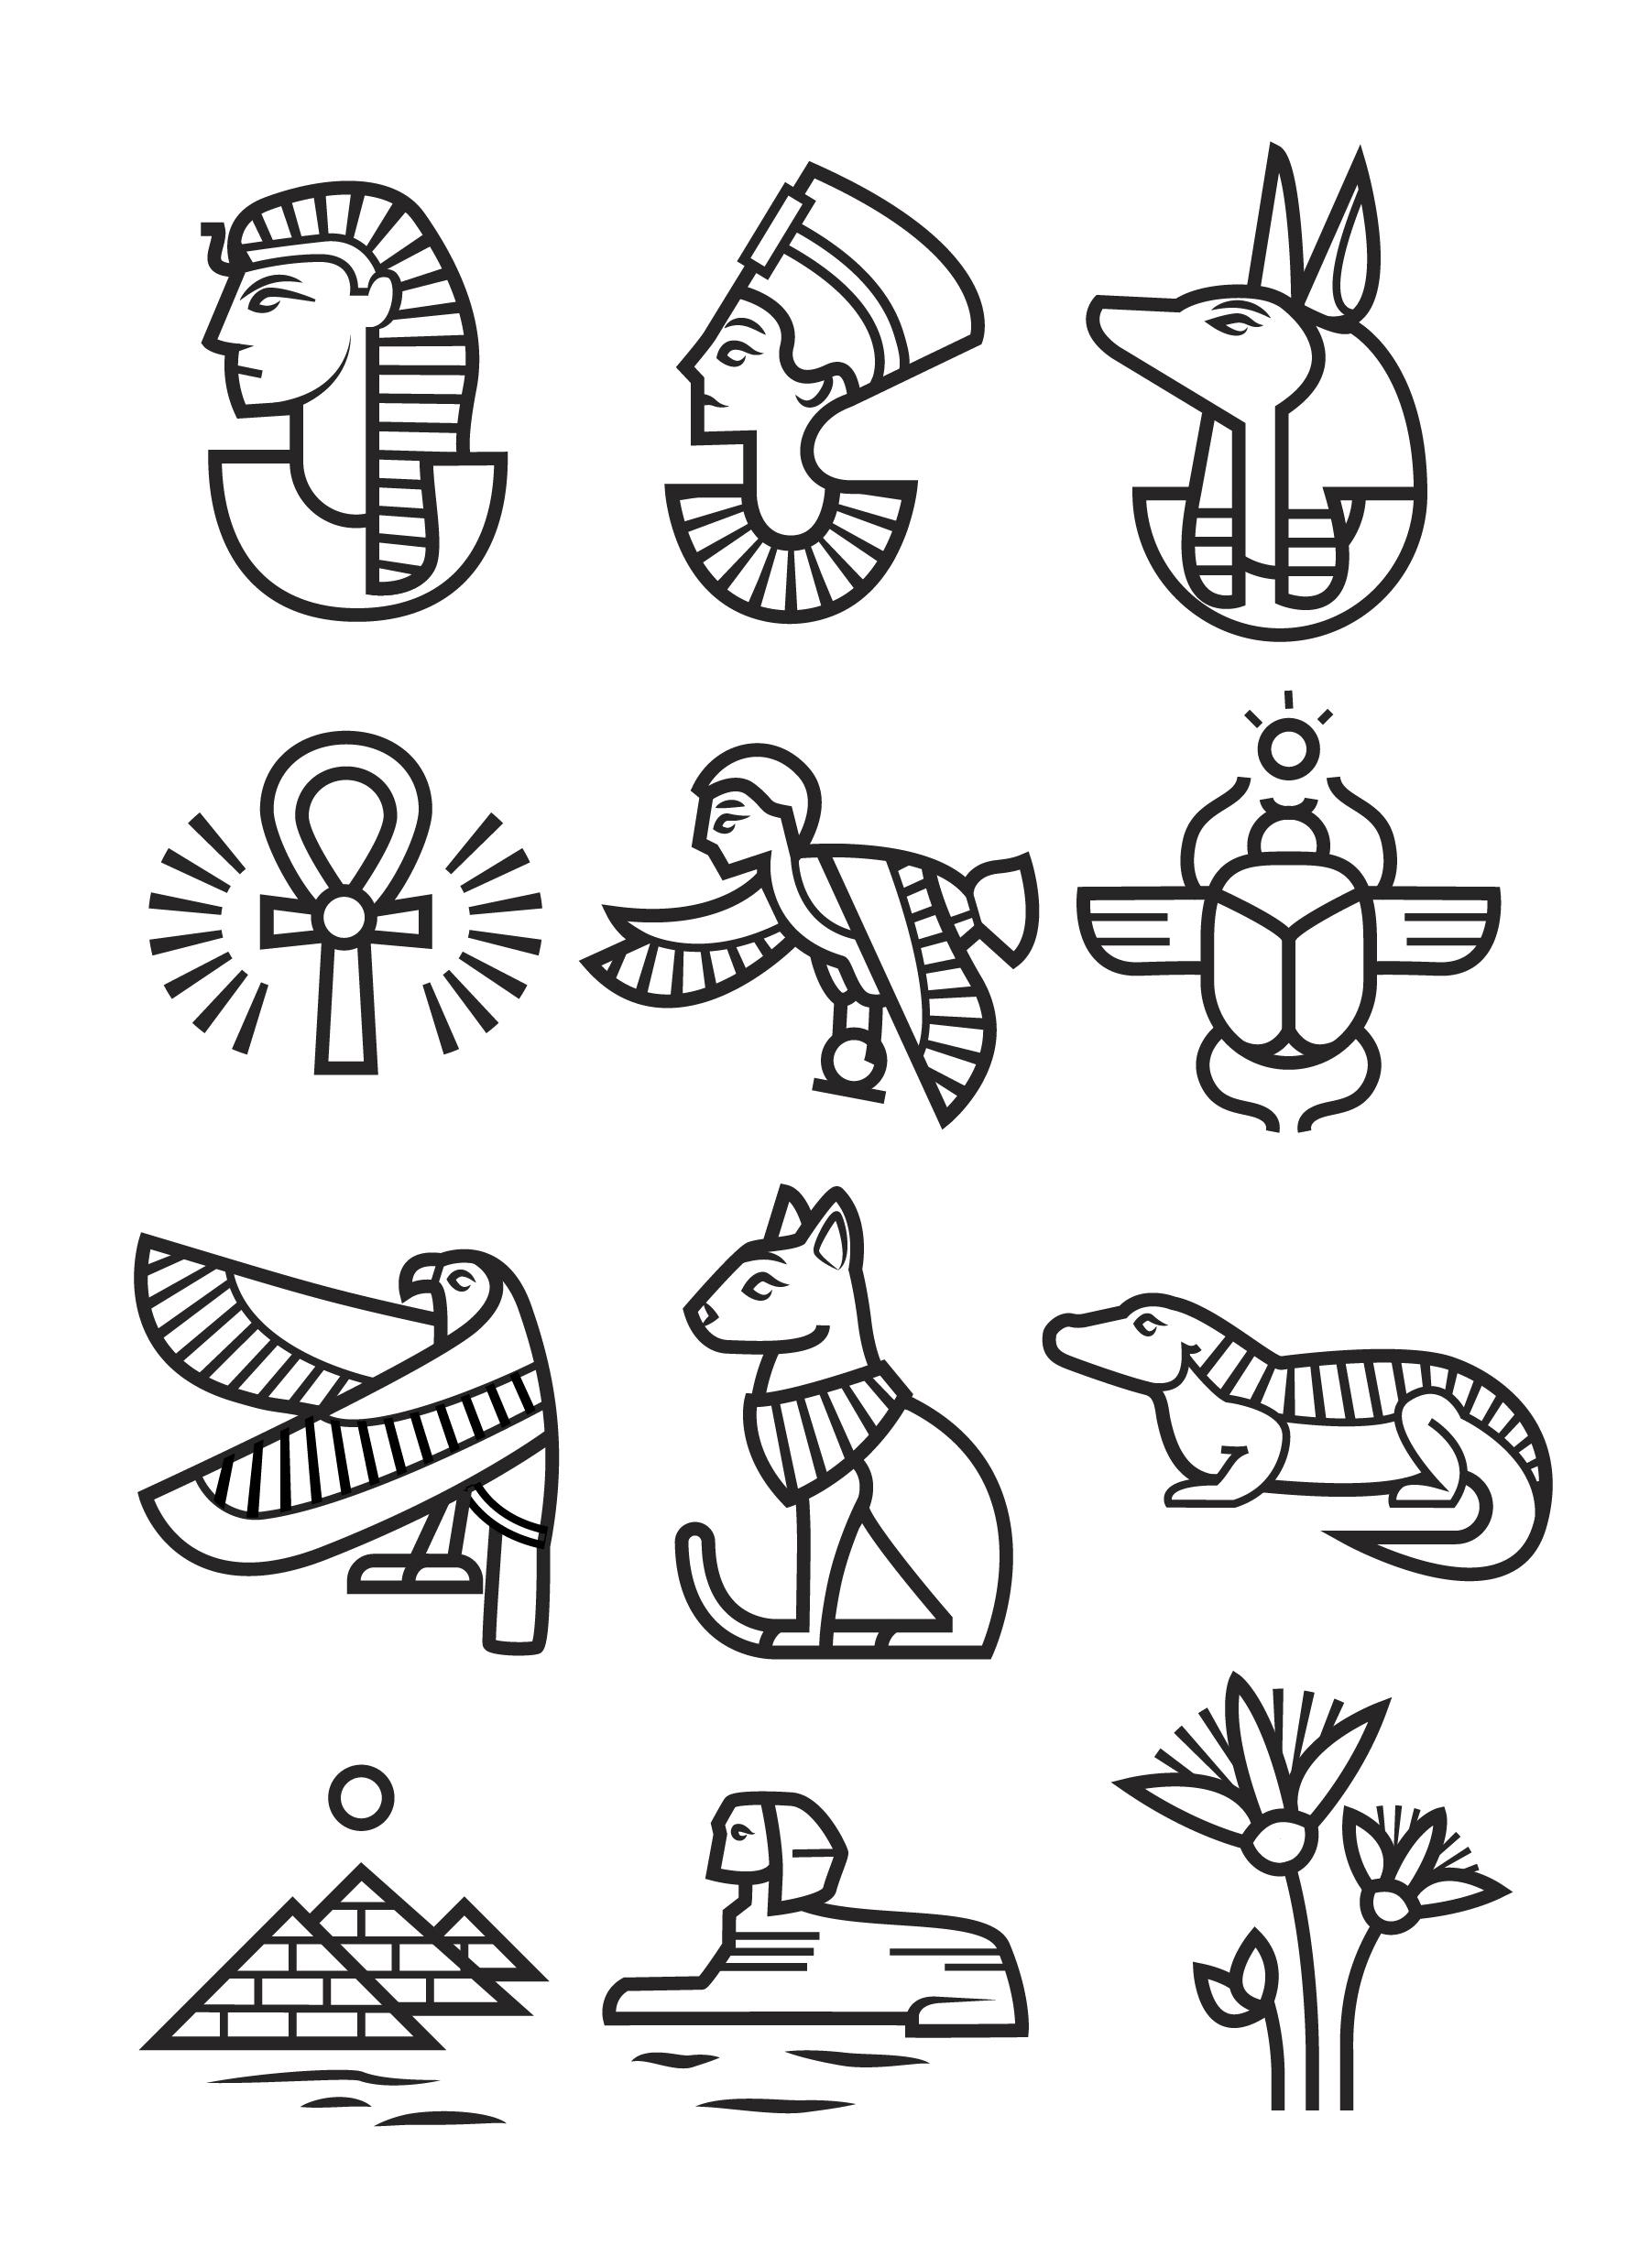 Ancient egypt clipart black and white jpg black and white library Janine Bushey   Portfolio jpg black and white library